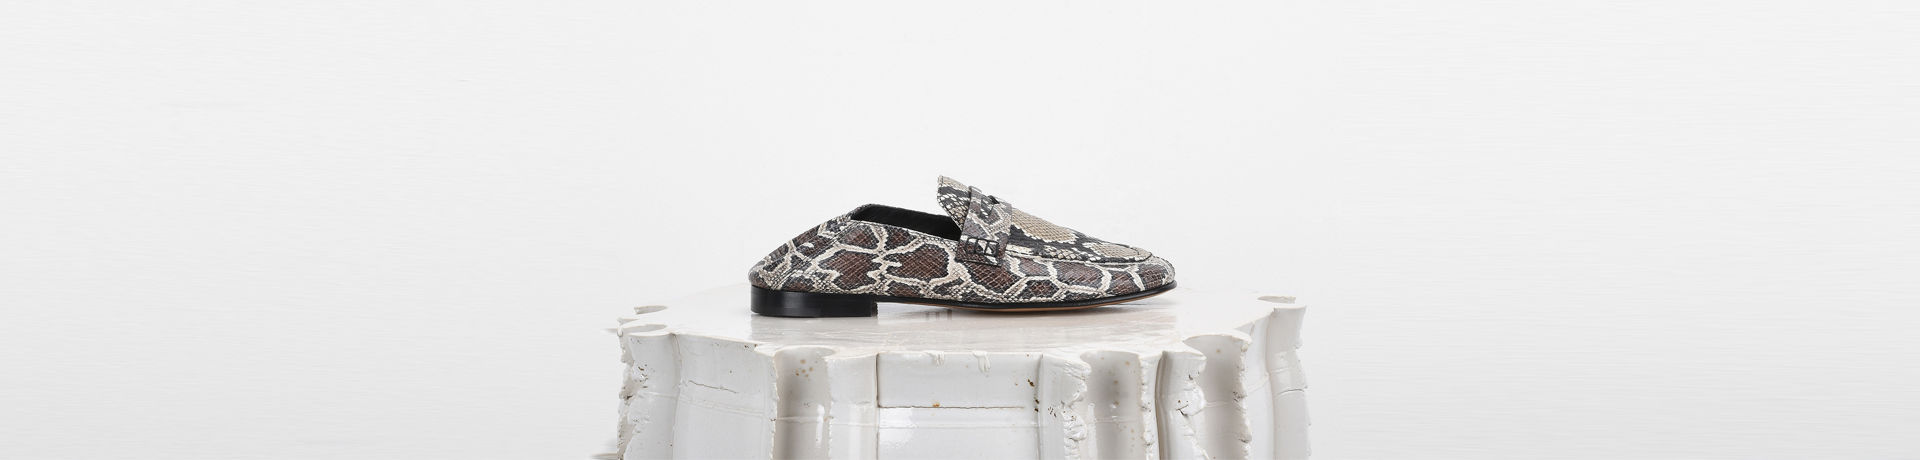 FEZZY 印纹乐福鞋